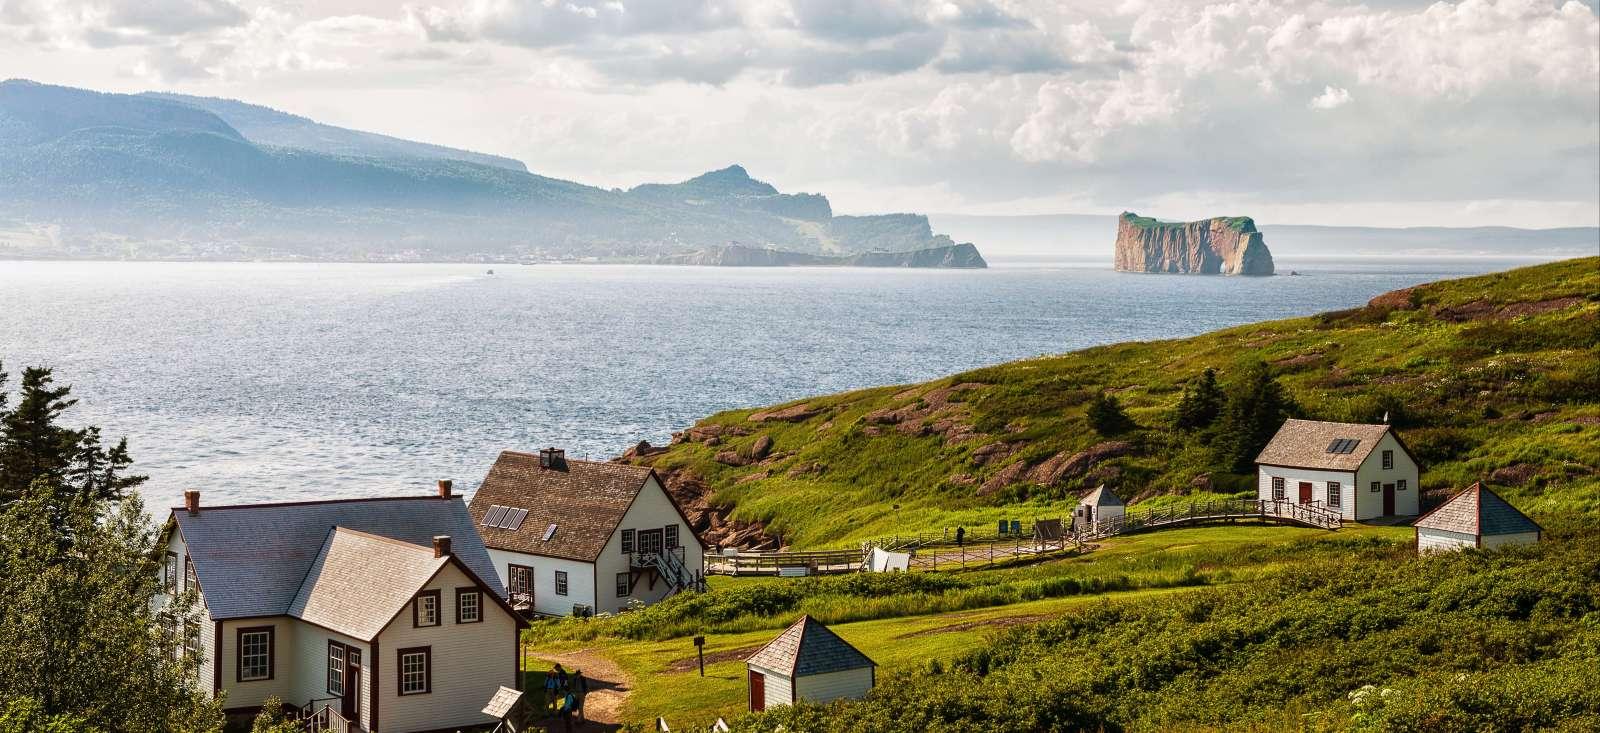 Voyage à pied : Bienvenue en Gaspésie